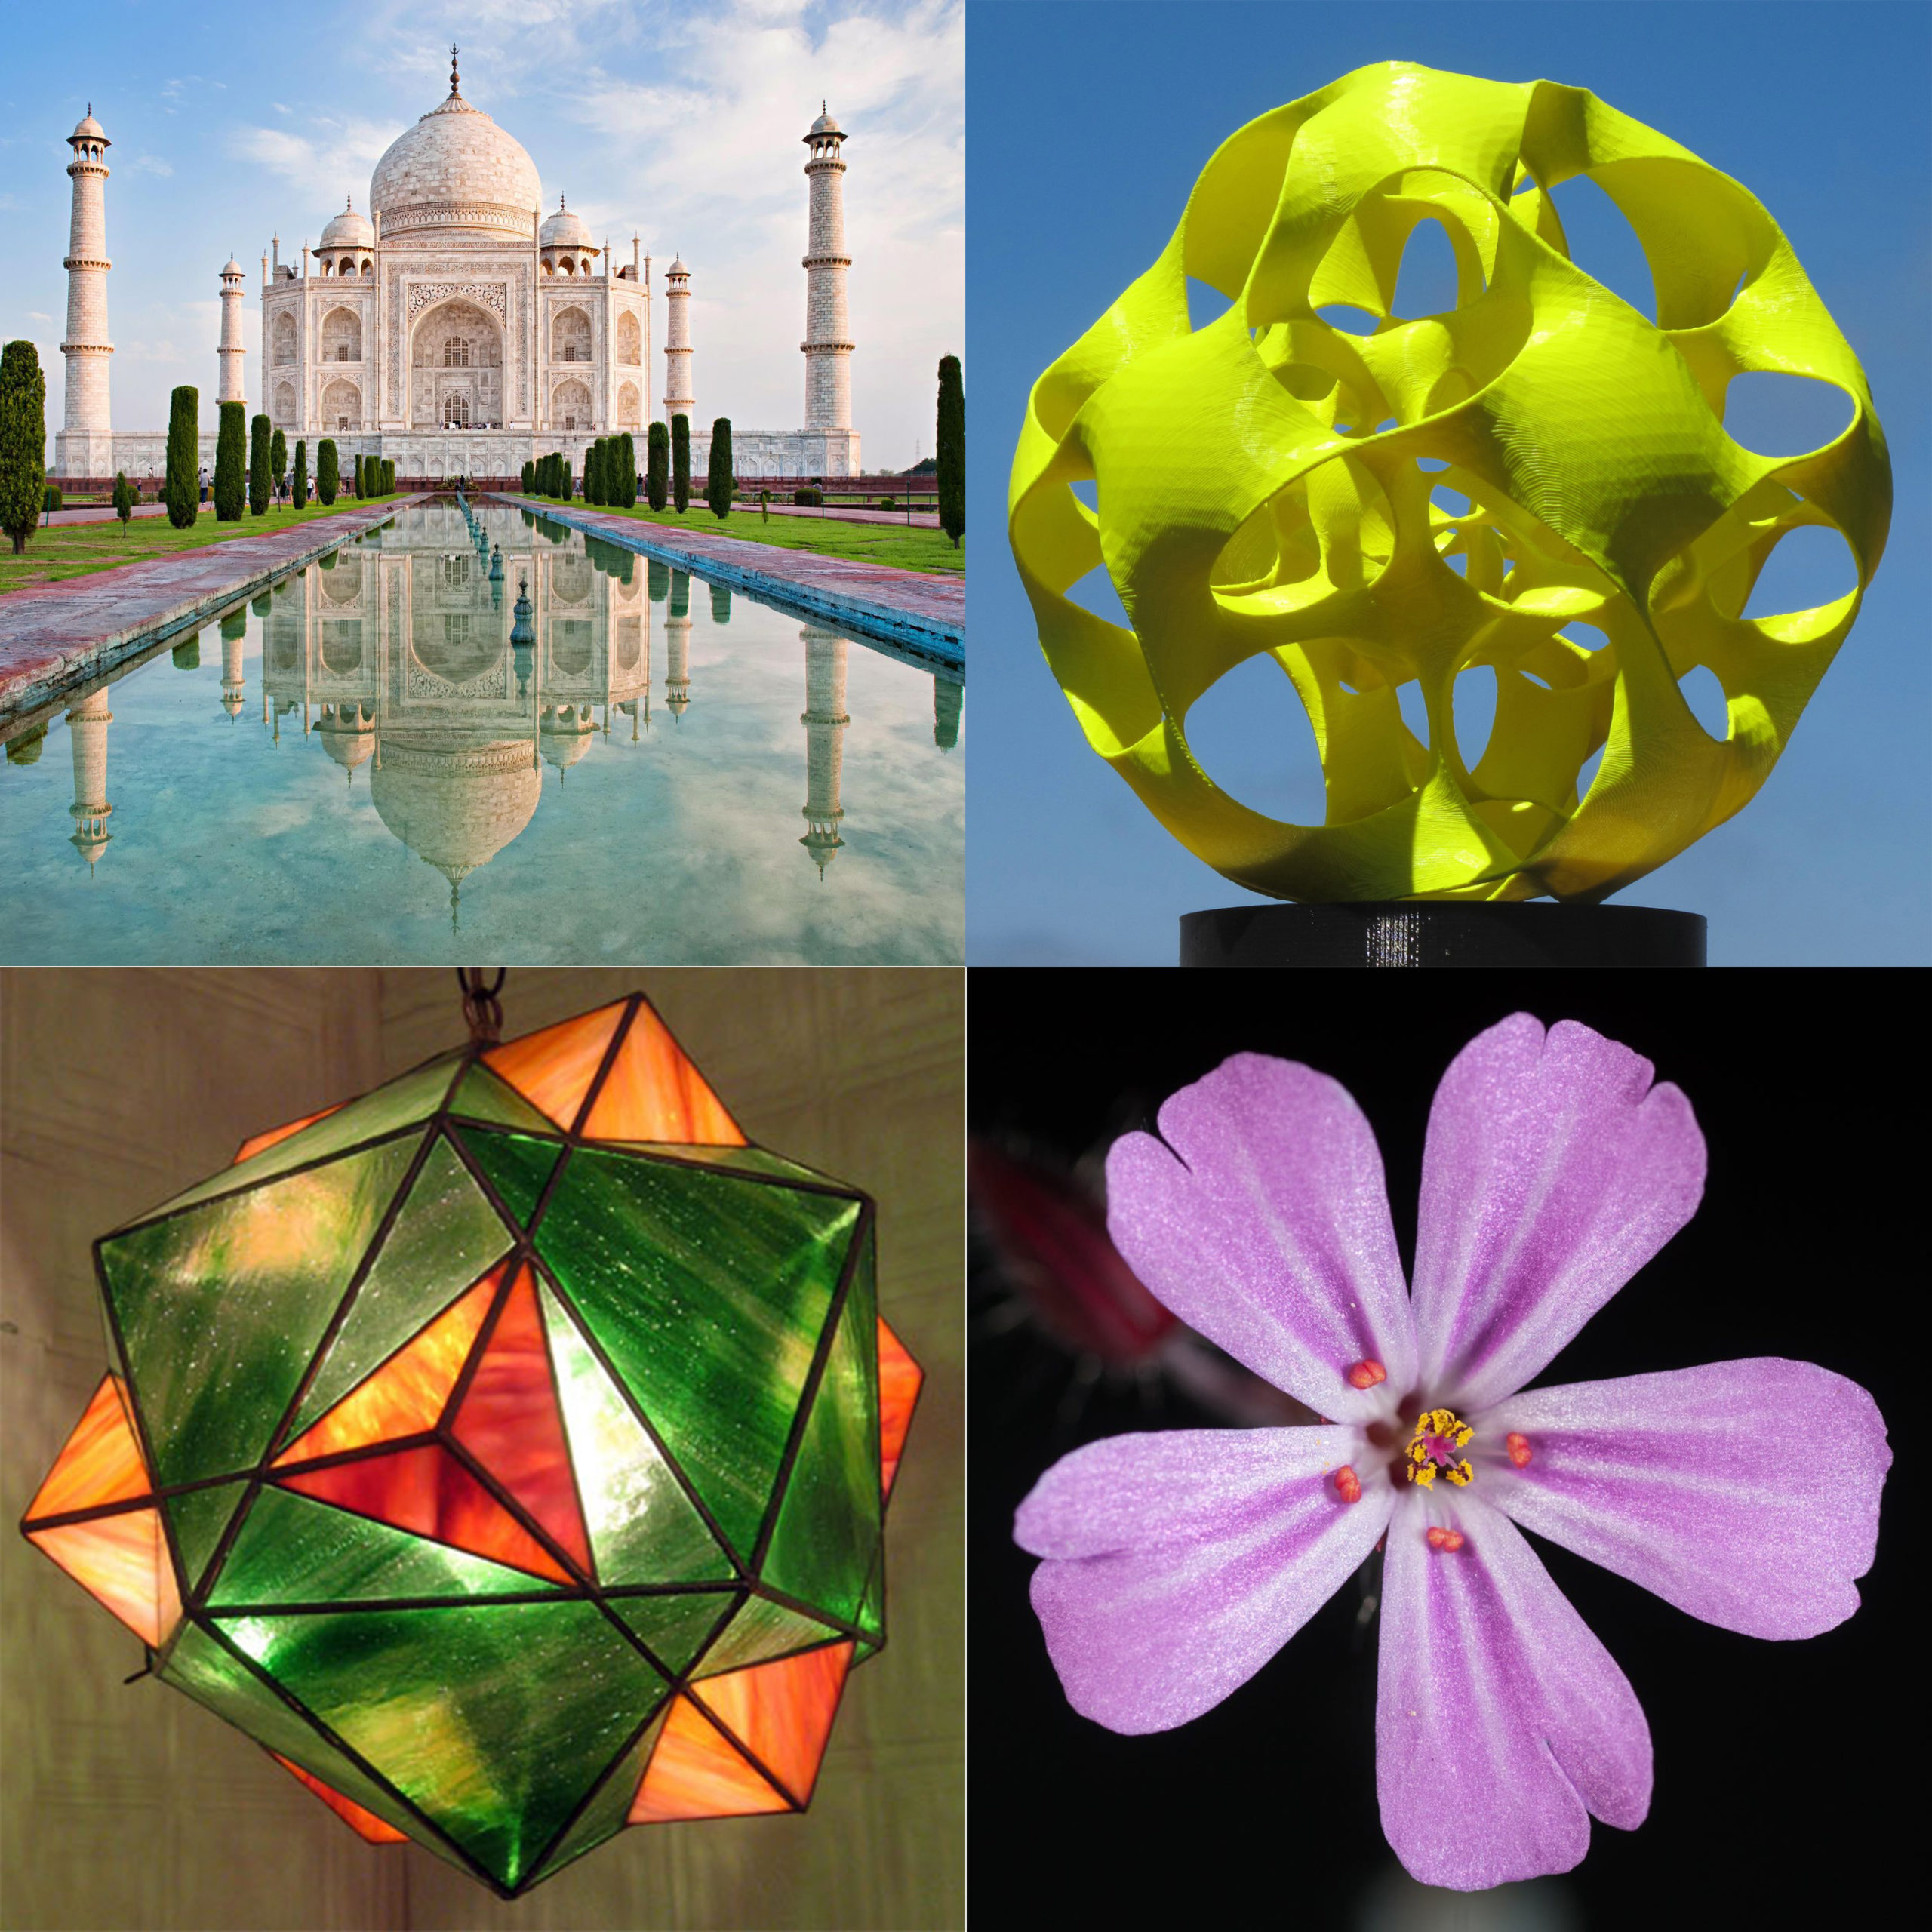 Art, science & mathematics of symmetry